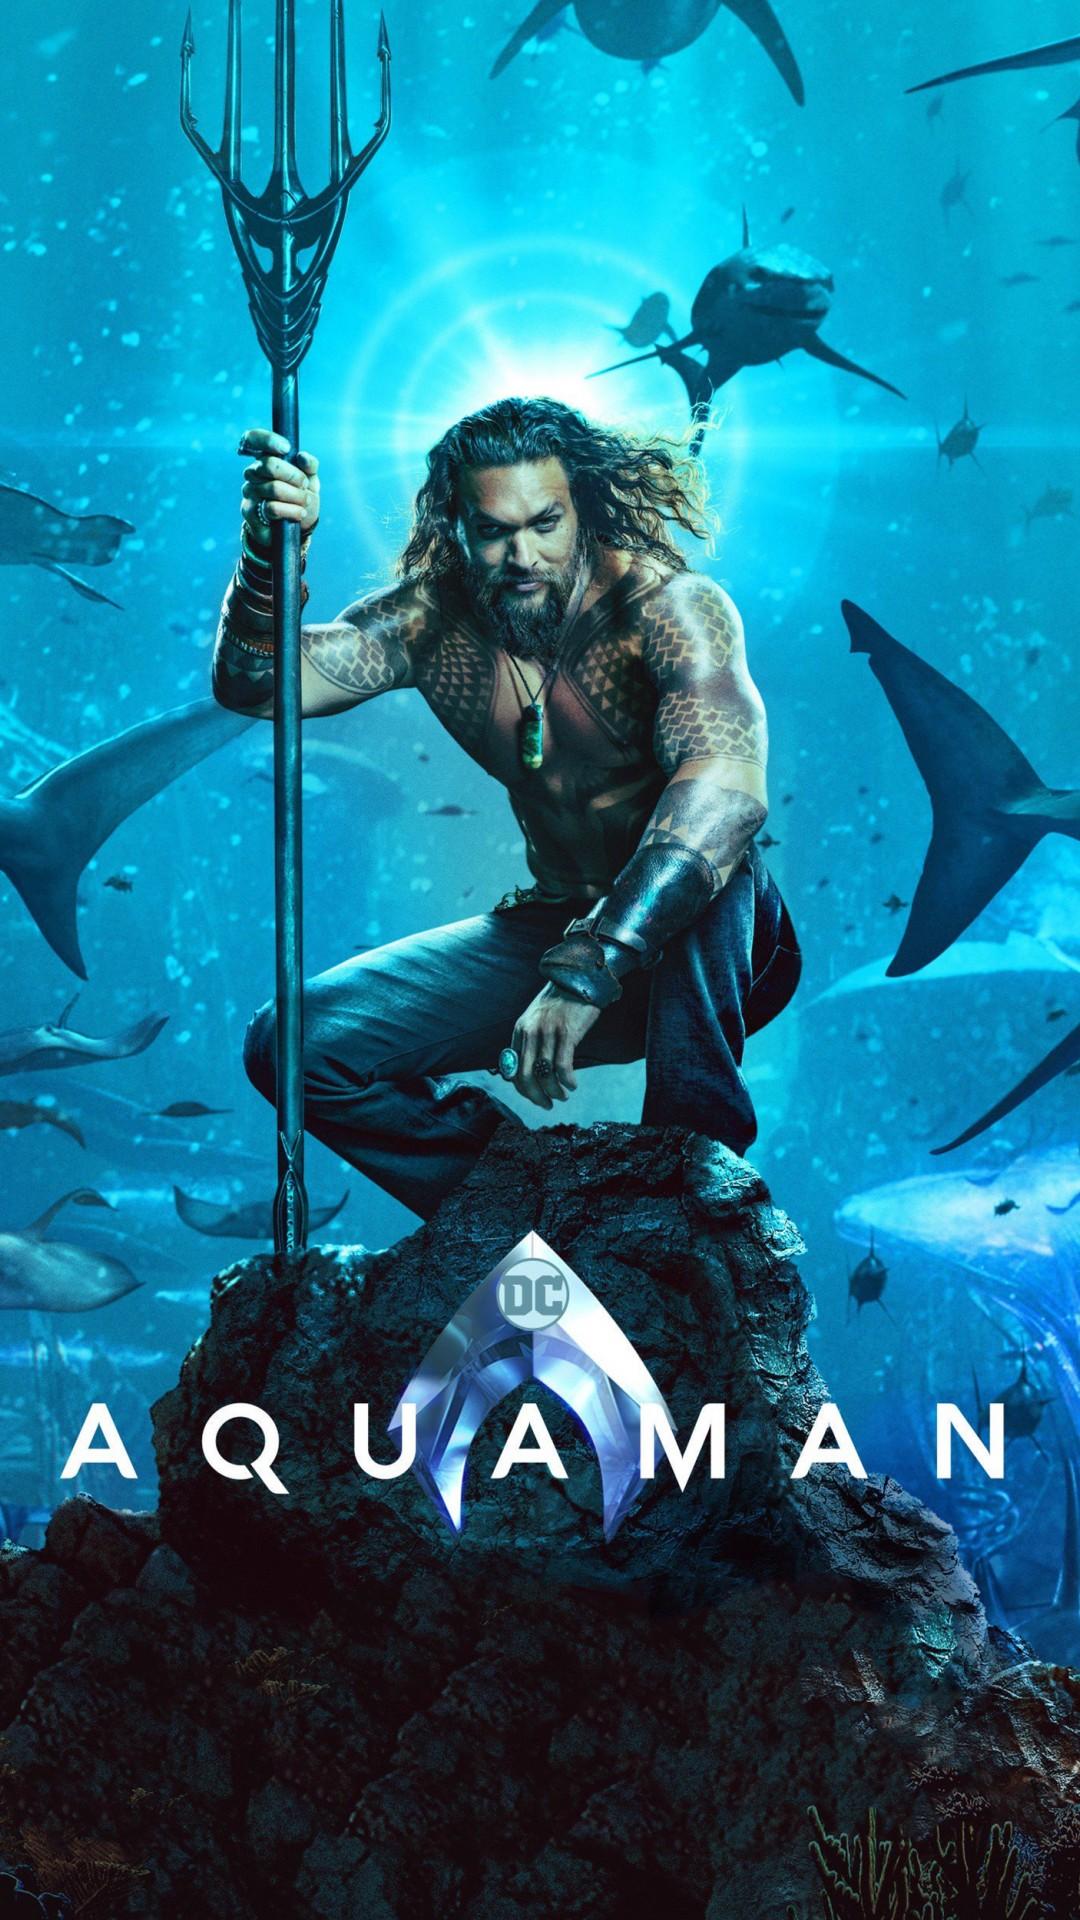 Aquaman 2018 Movie Wallpaper Iphone 6 6s Plus Hd Wallpaper